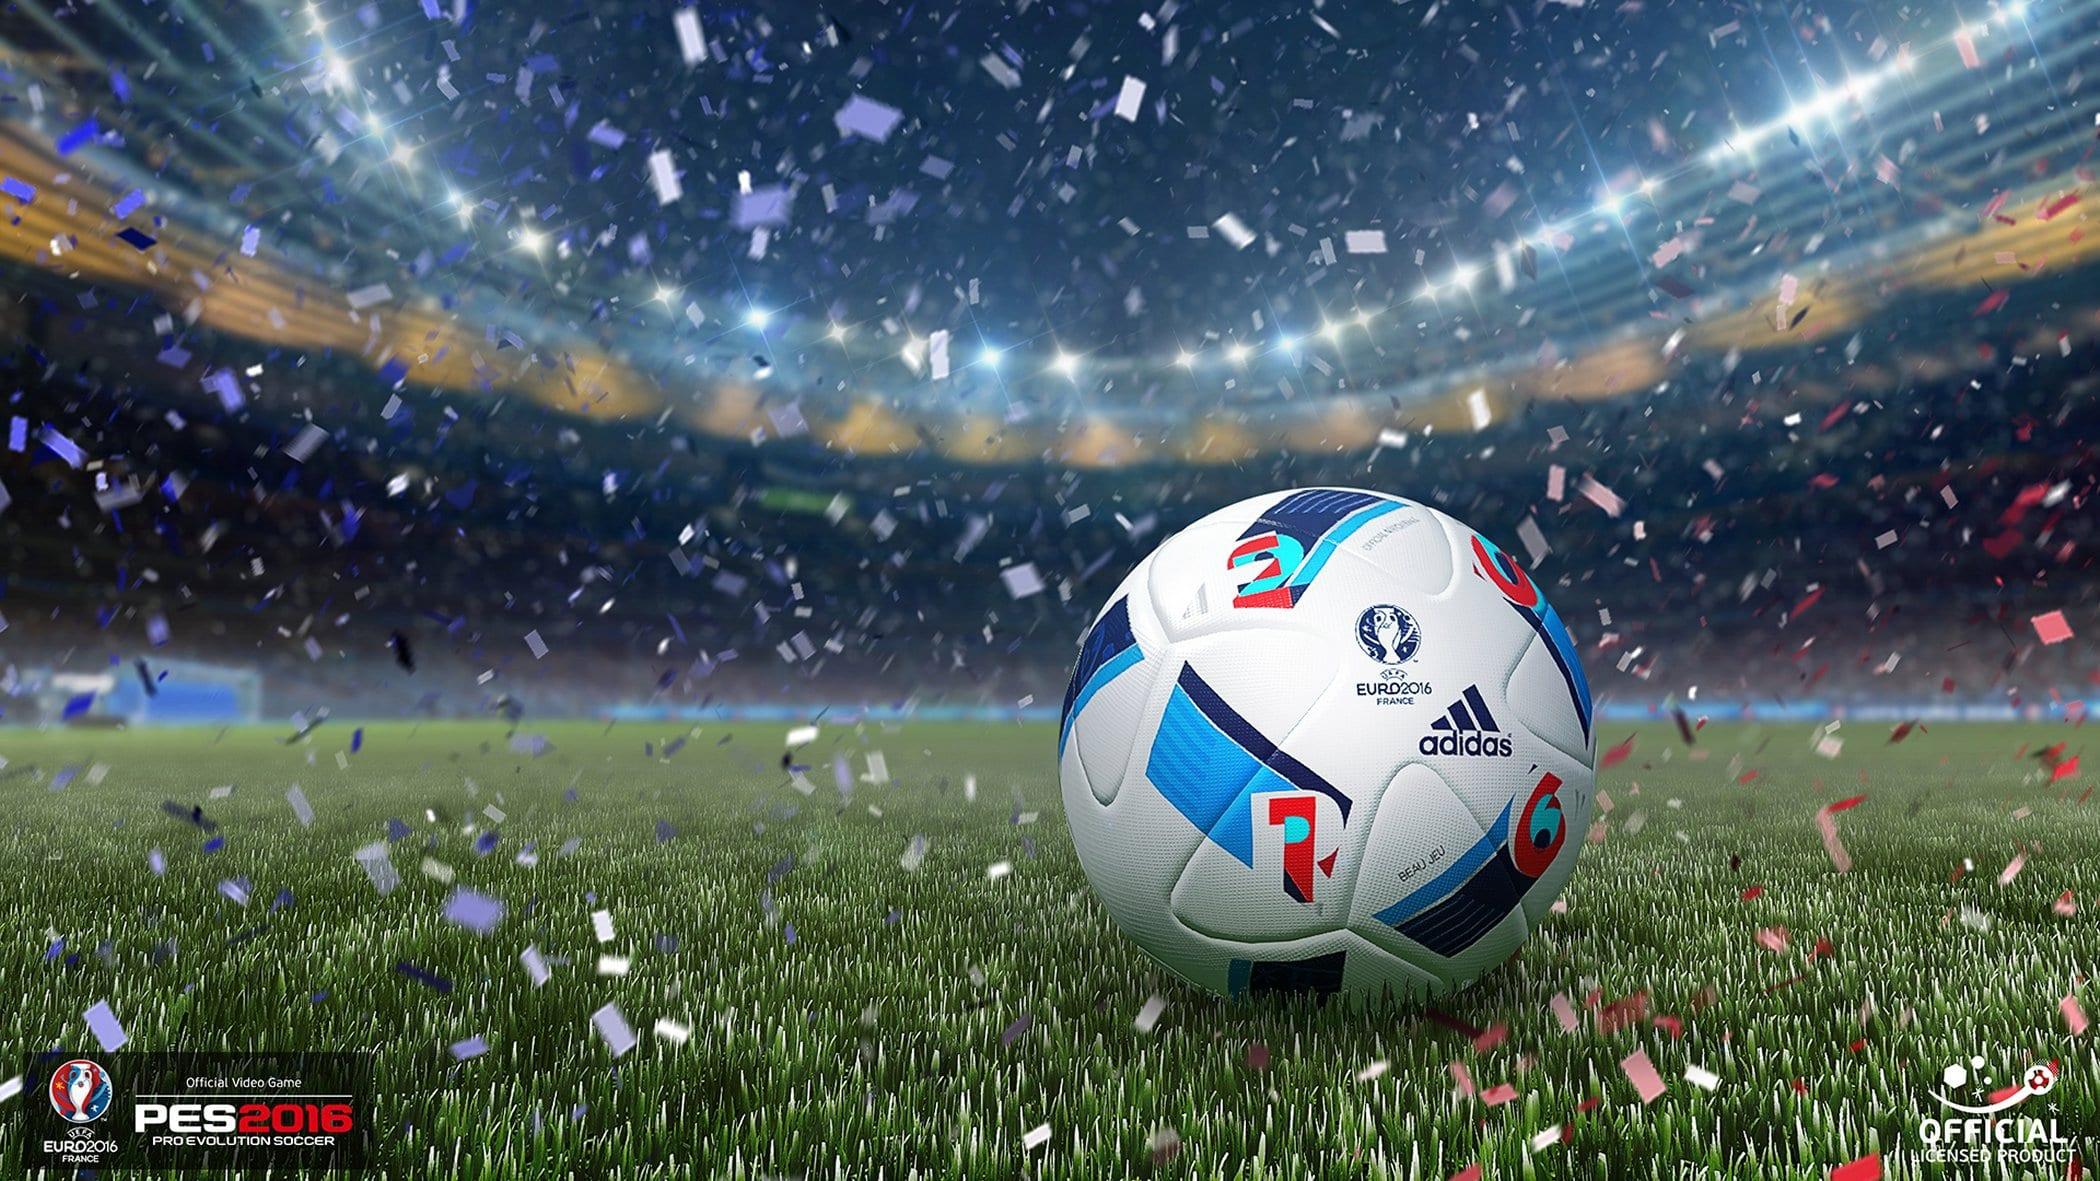 Careers - Job opportunities UEFA. org